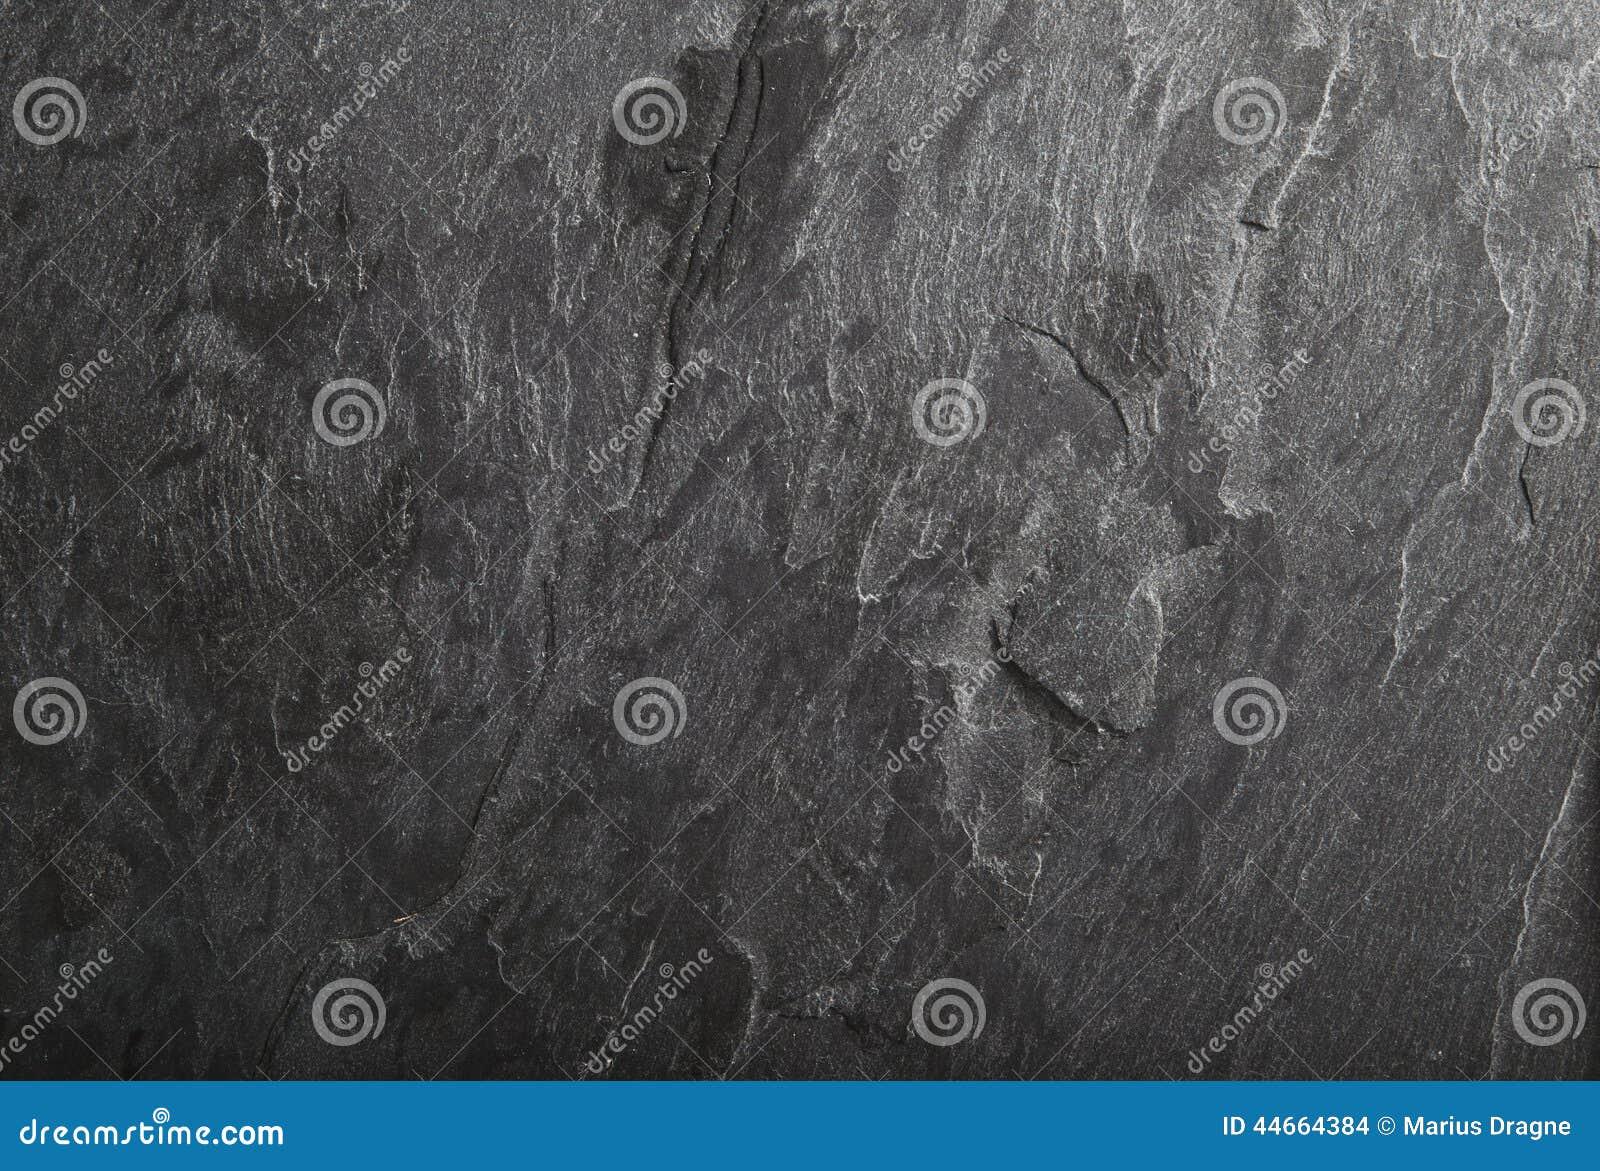 Black slate rock background texture